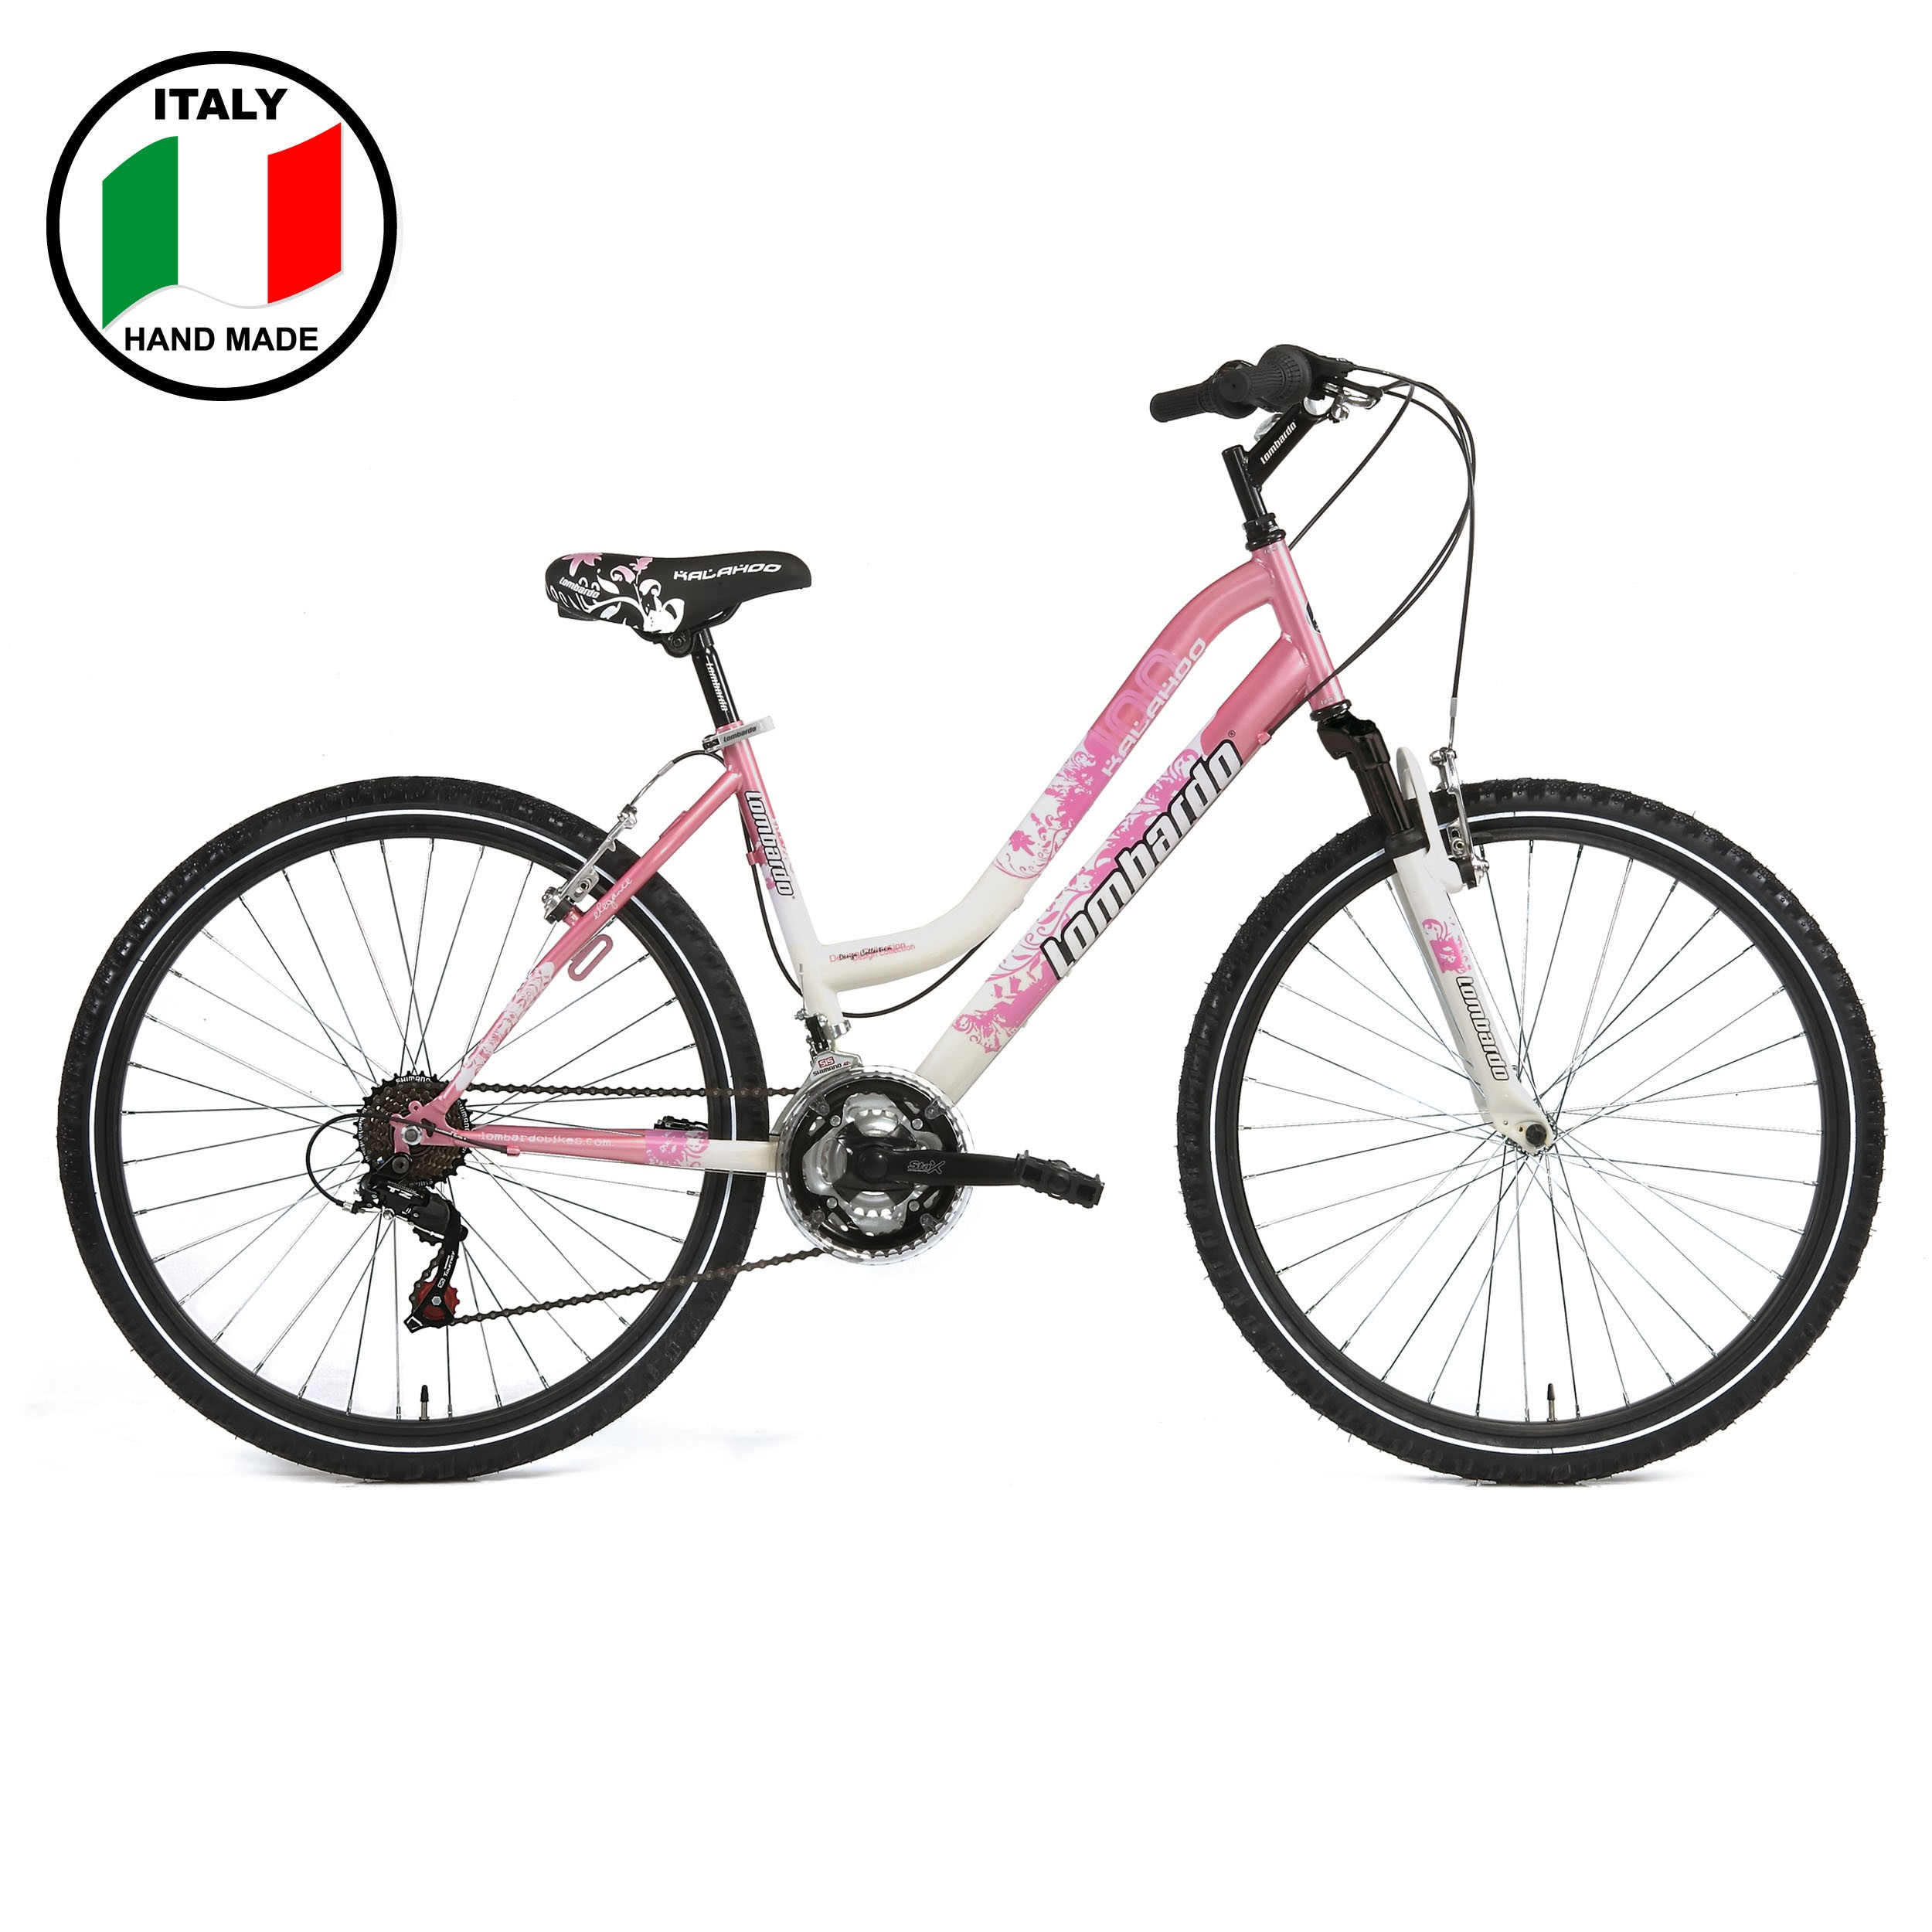 Lombardo Kalahoo  26 inch Bike- Pink and White